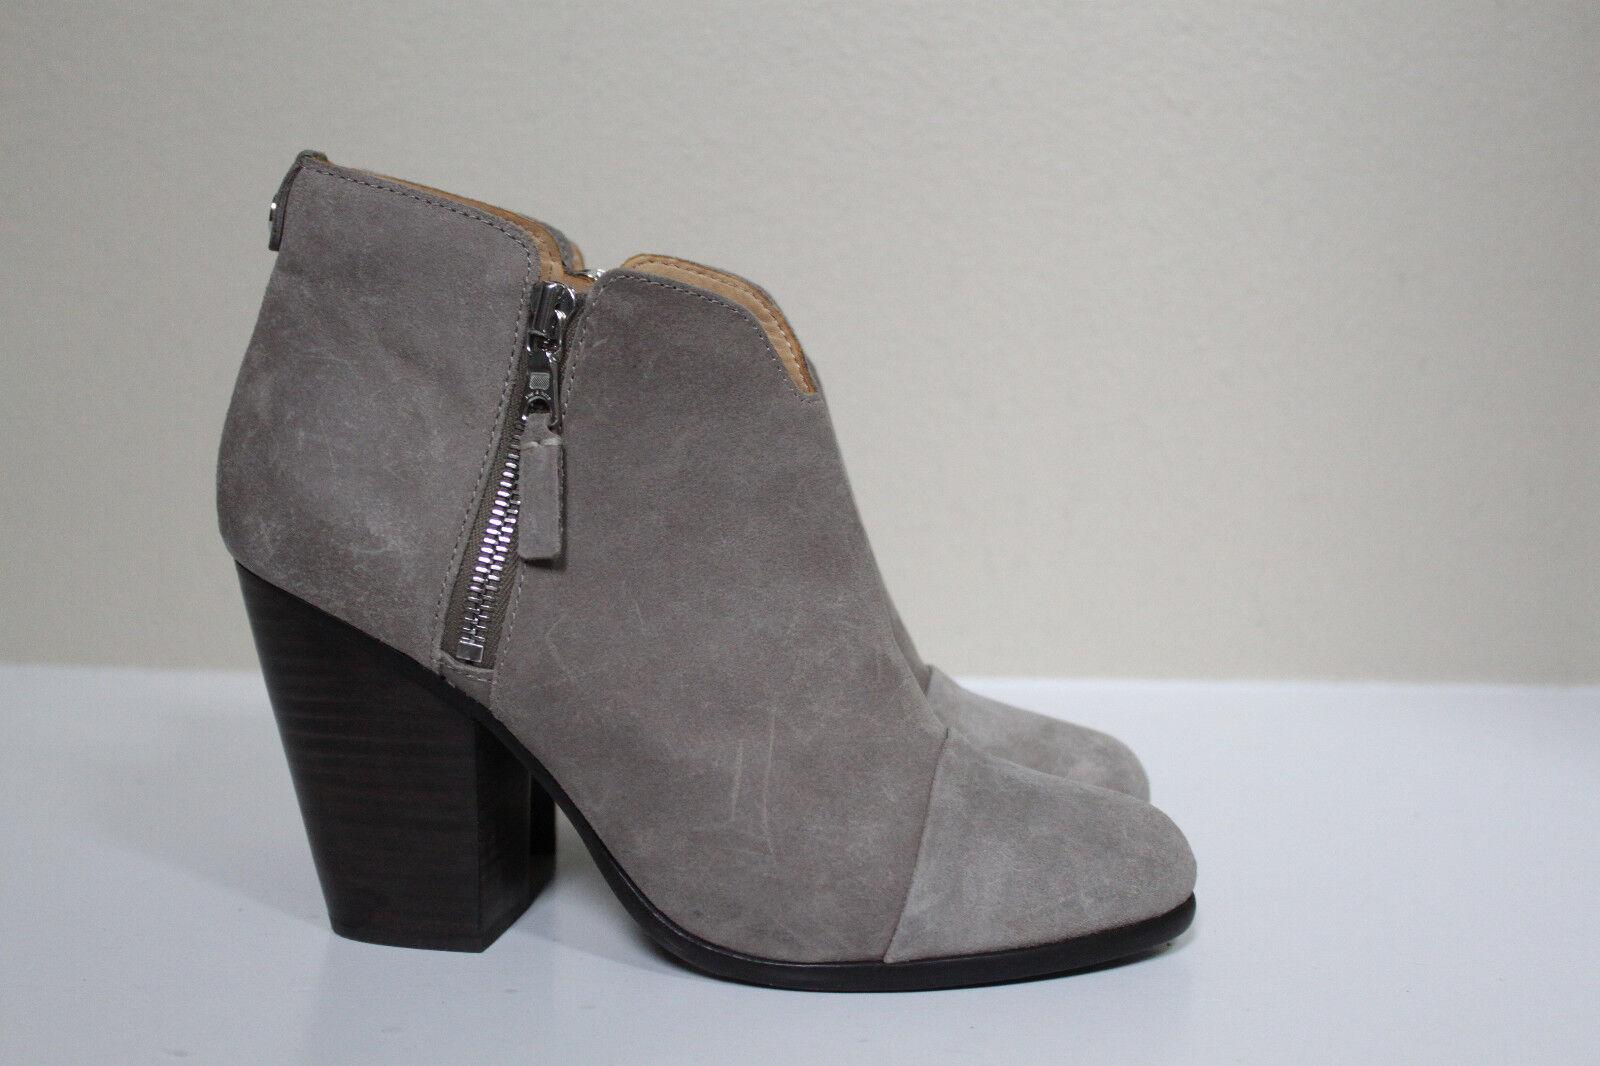 sz 8.5 / 38.5 Rag & Bone Margot Warm Gray Ankle Side Zip Bootie Heel Shoes